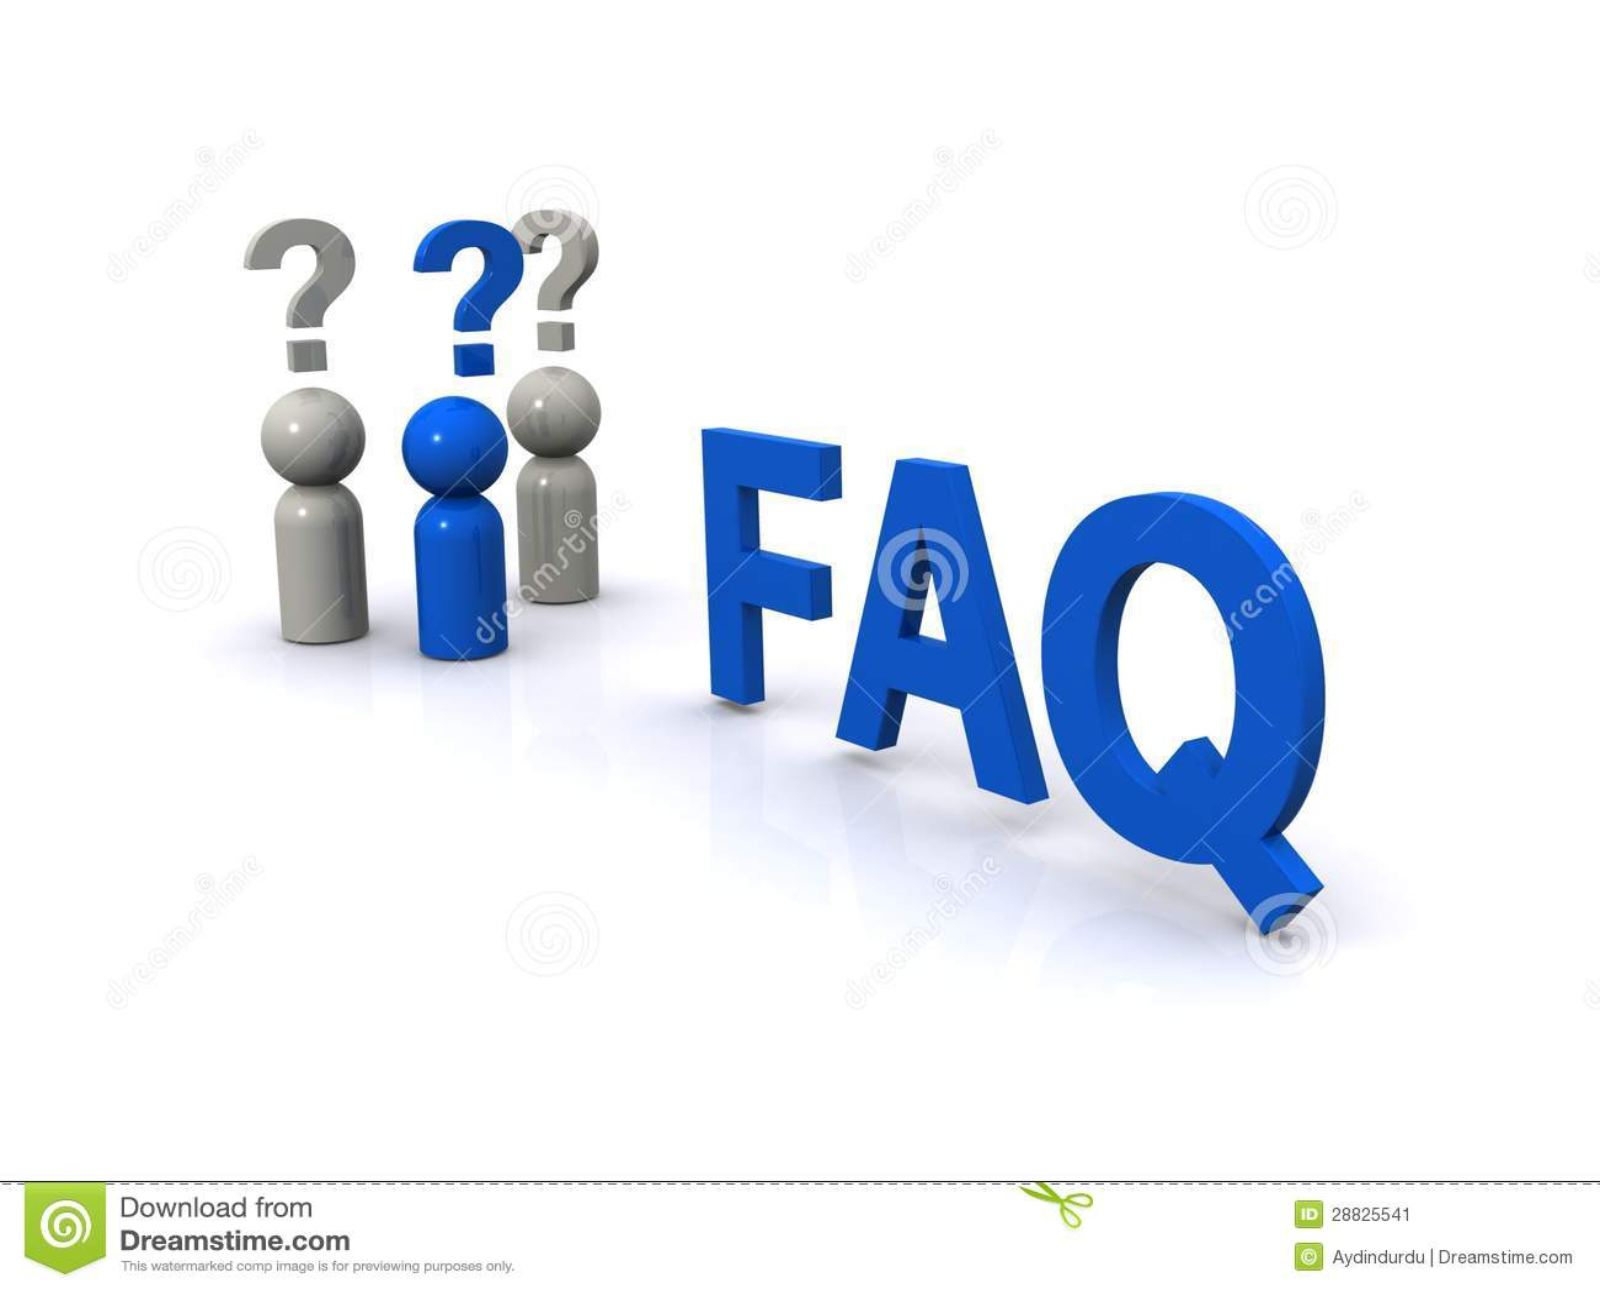 Preguntas con frecuencia hechas